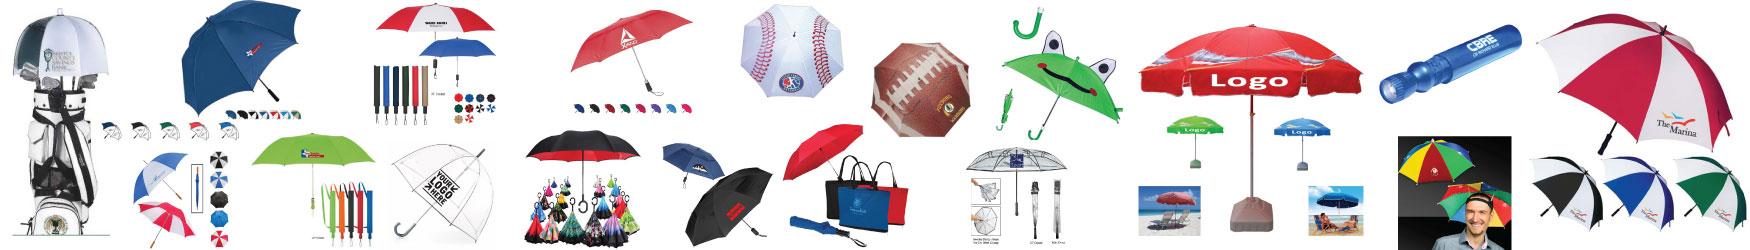 custom logo umbrellas, vented umbrellas, telescoping umbrellas, texas branders